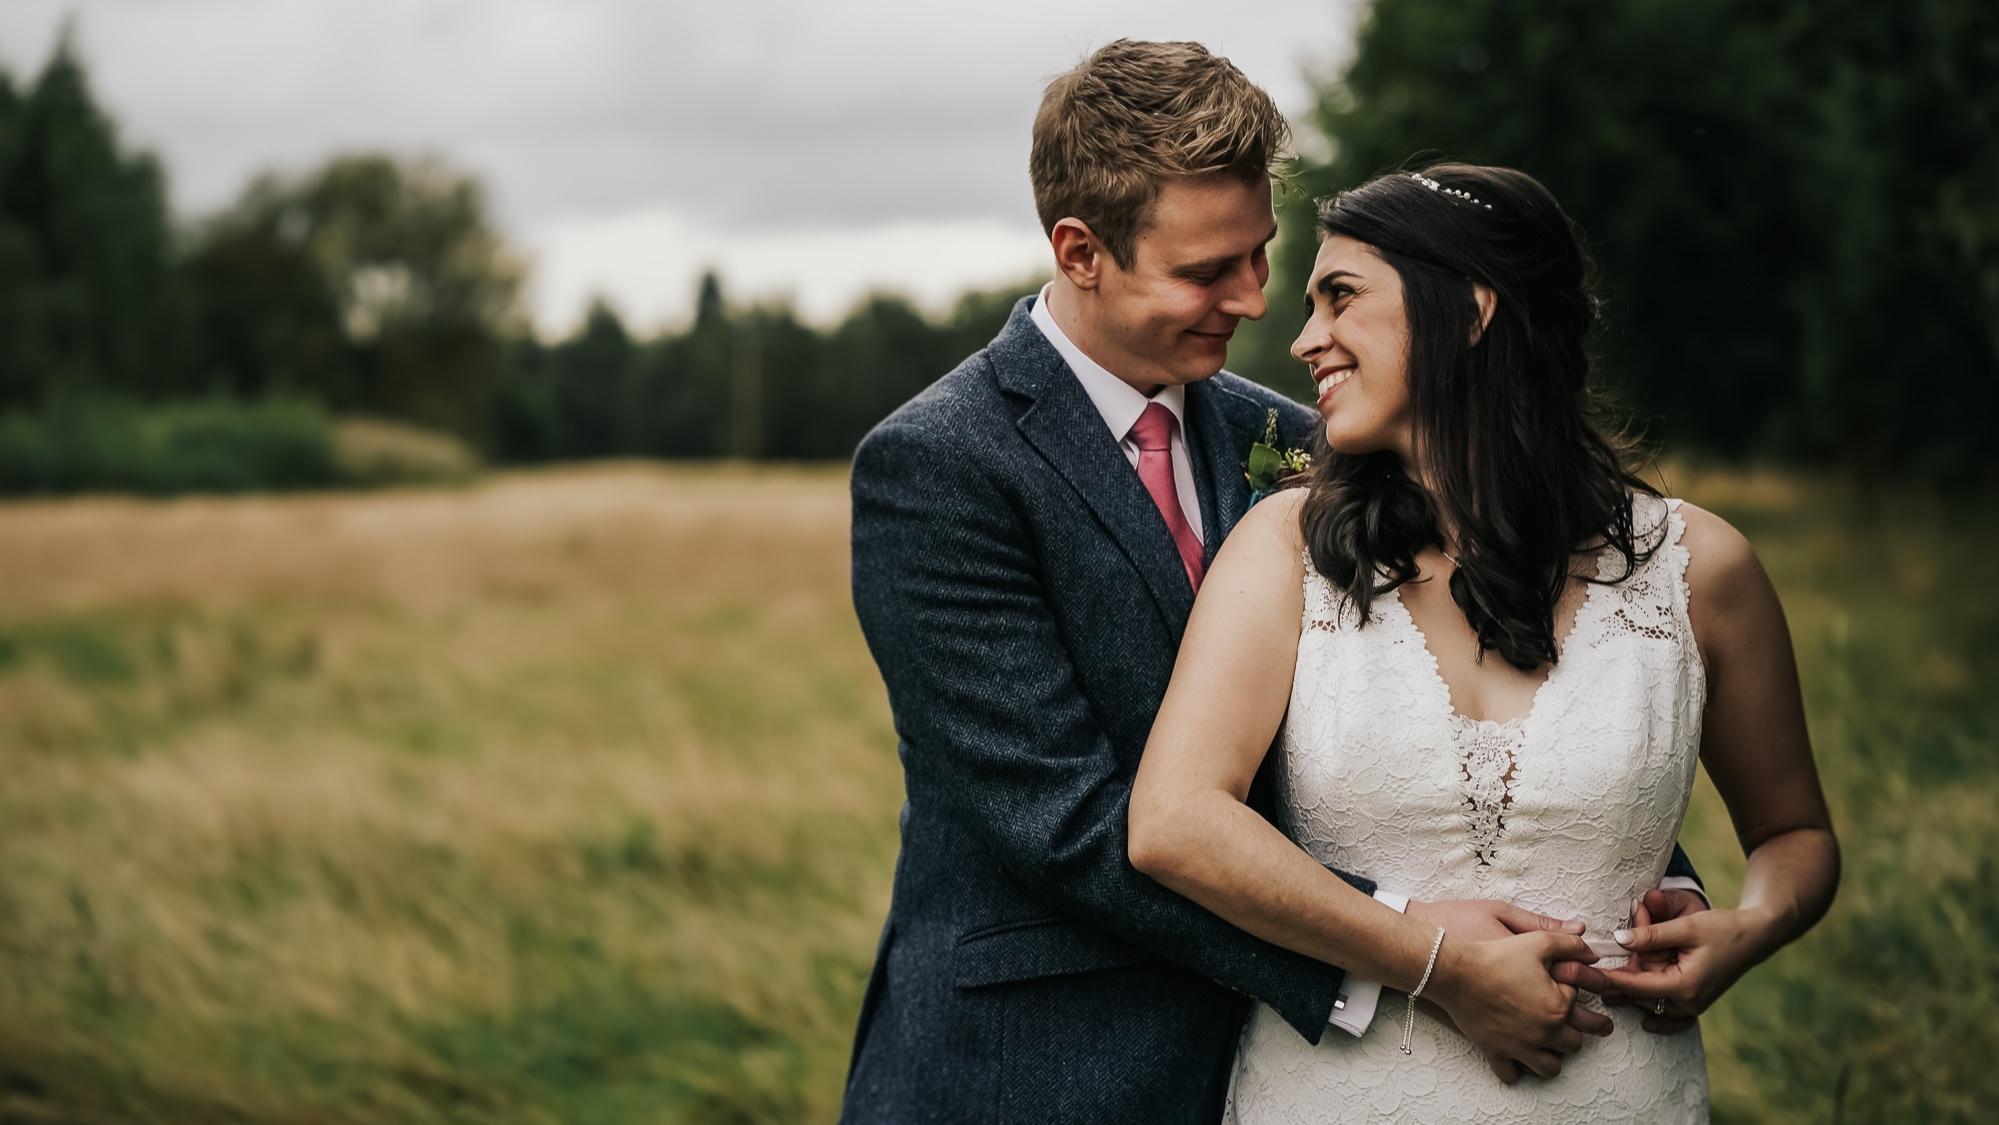 Oak+tree+of+peover+wedding+photography+cheshire+wedding+photographer+%2852+of+56%29.jpg